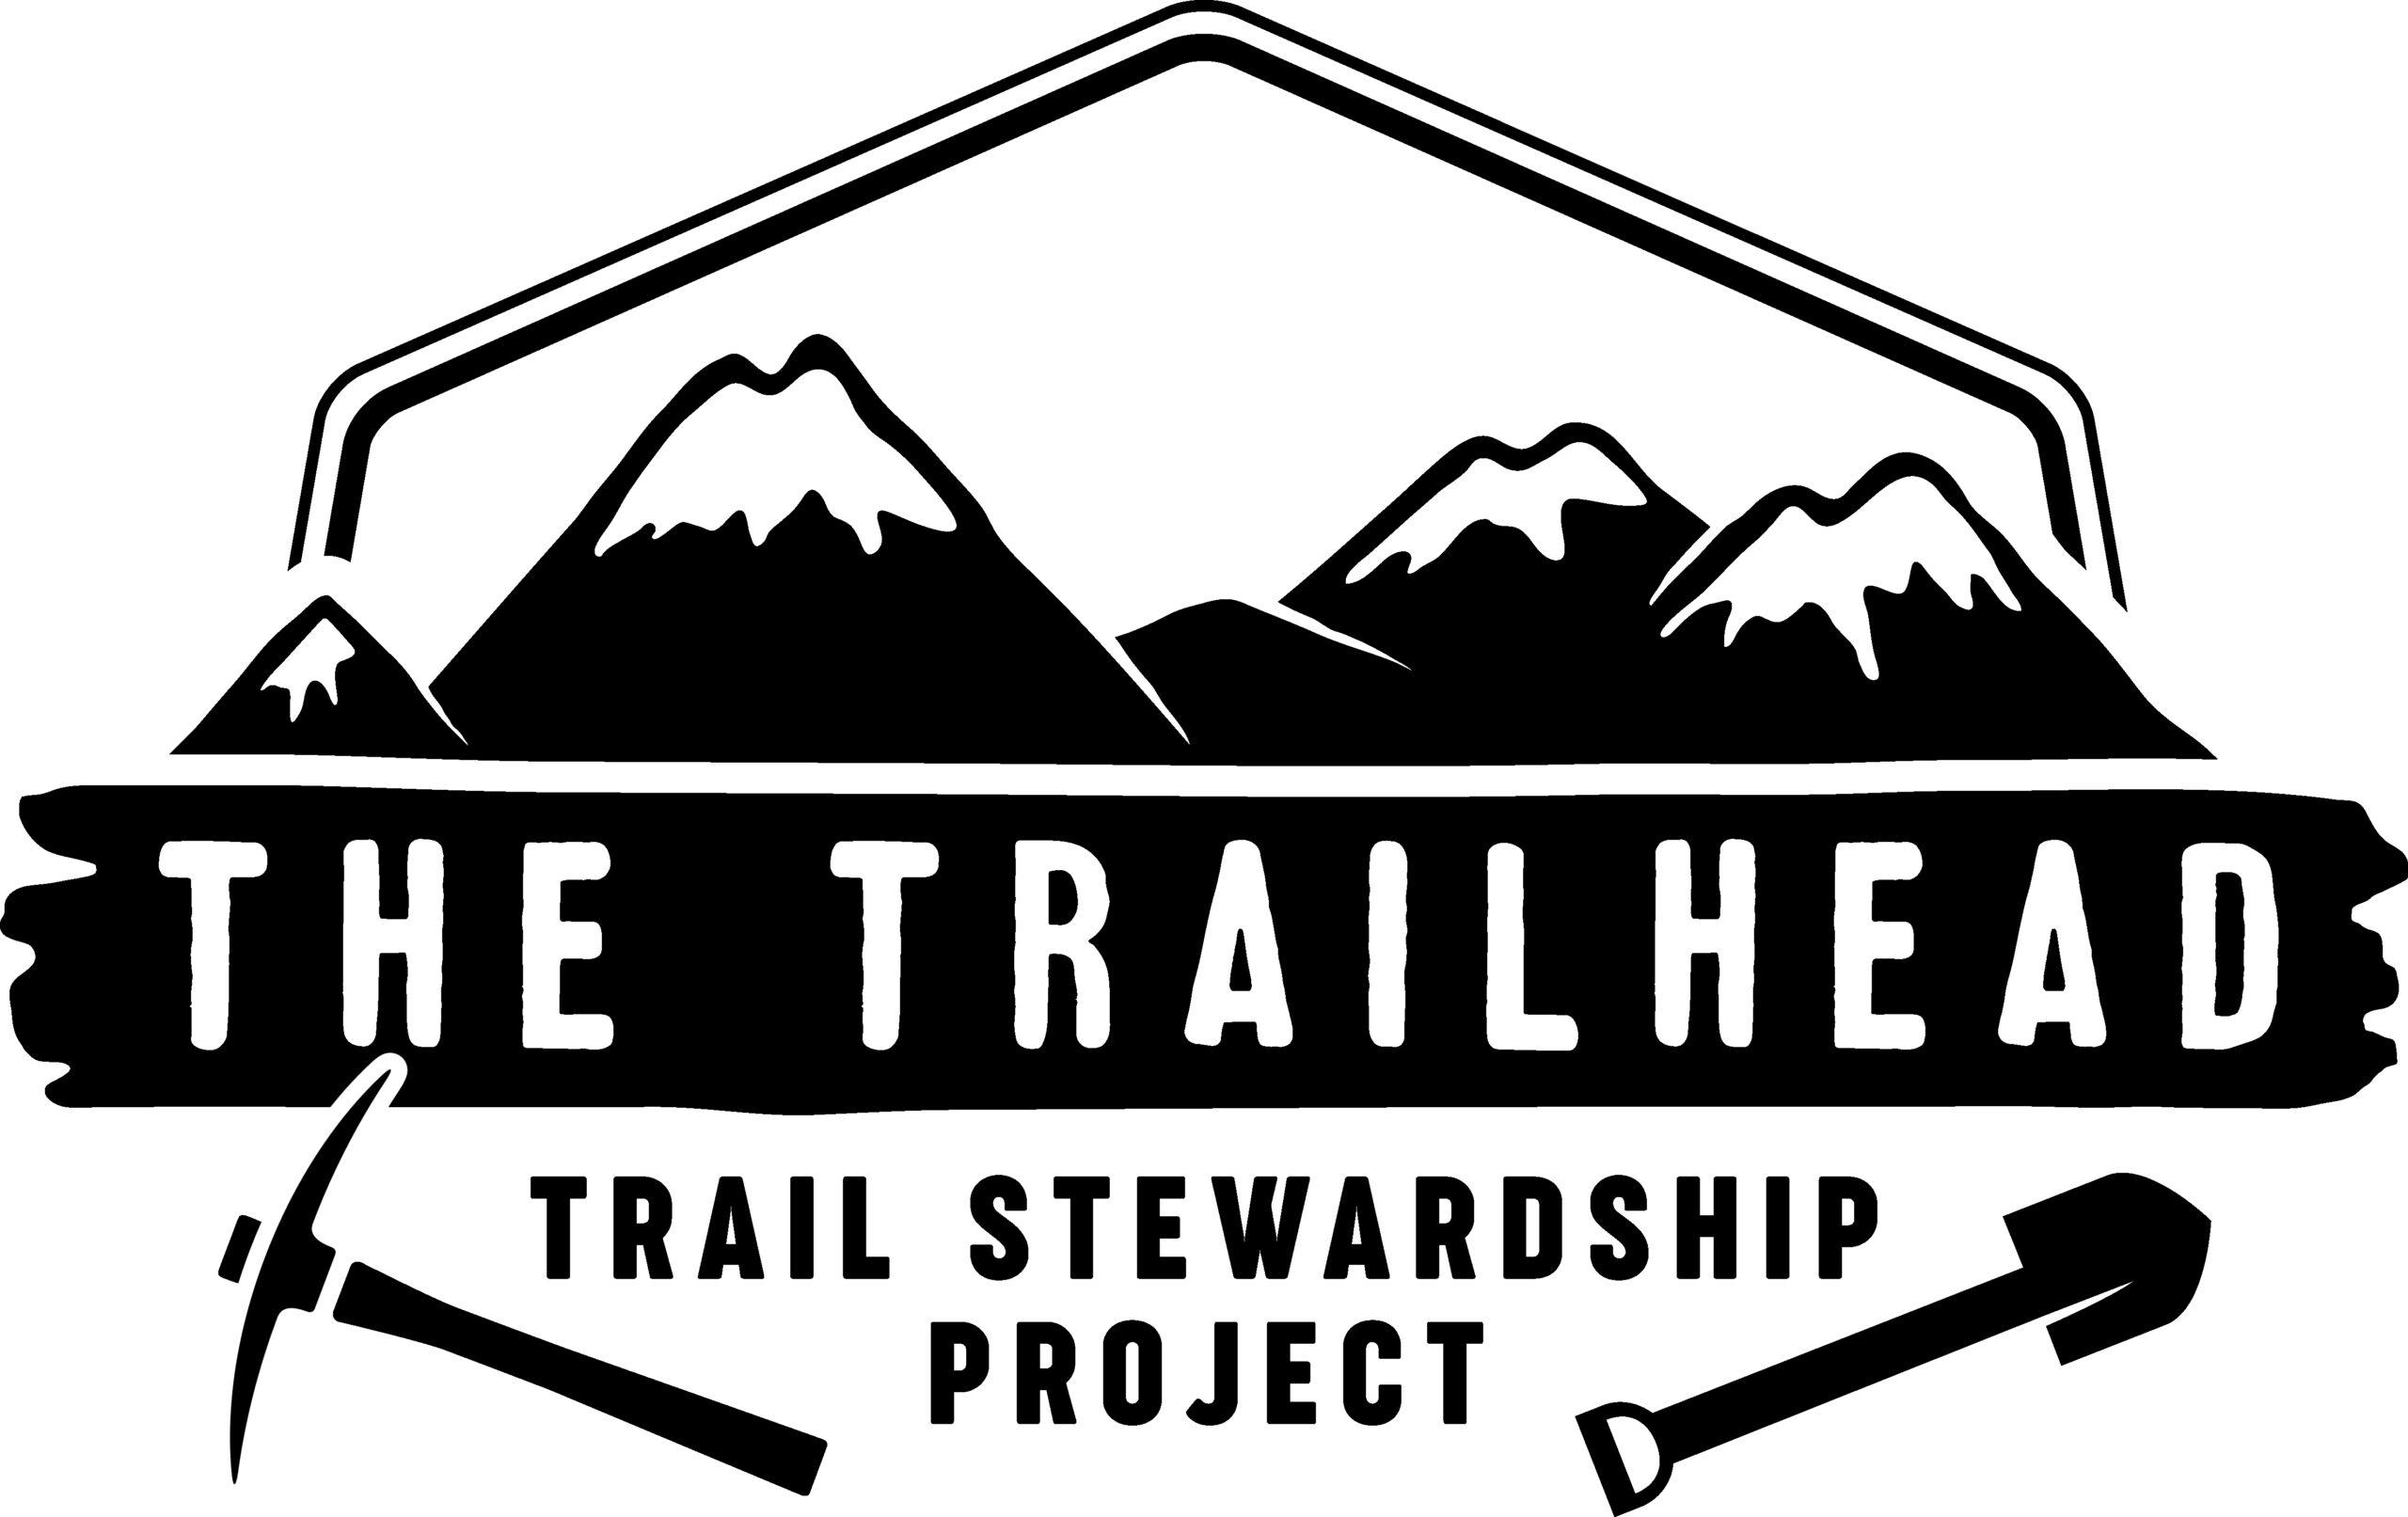 The Trailhead Stewardship Project